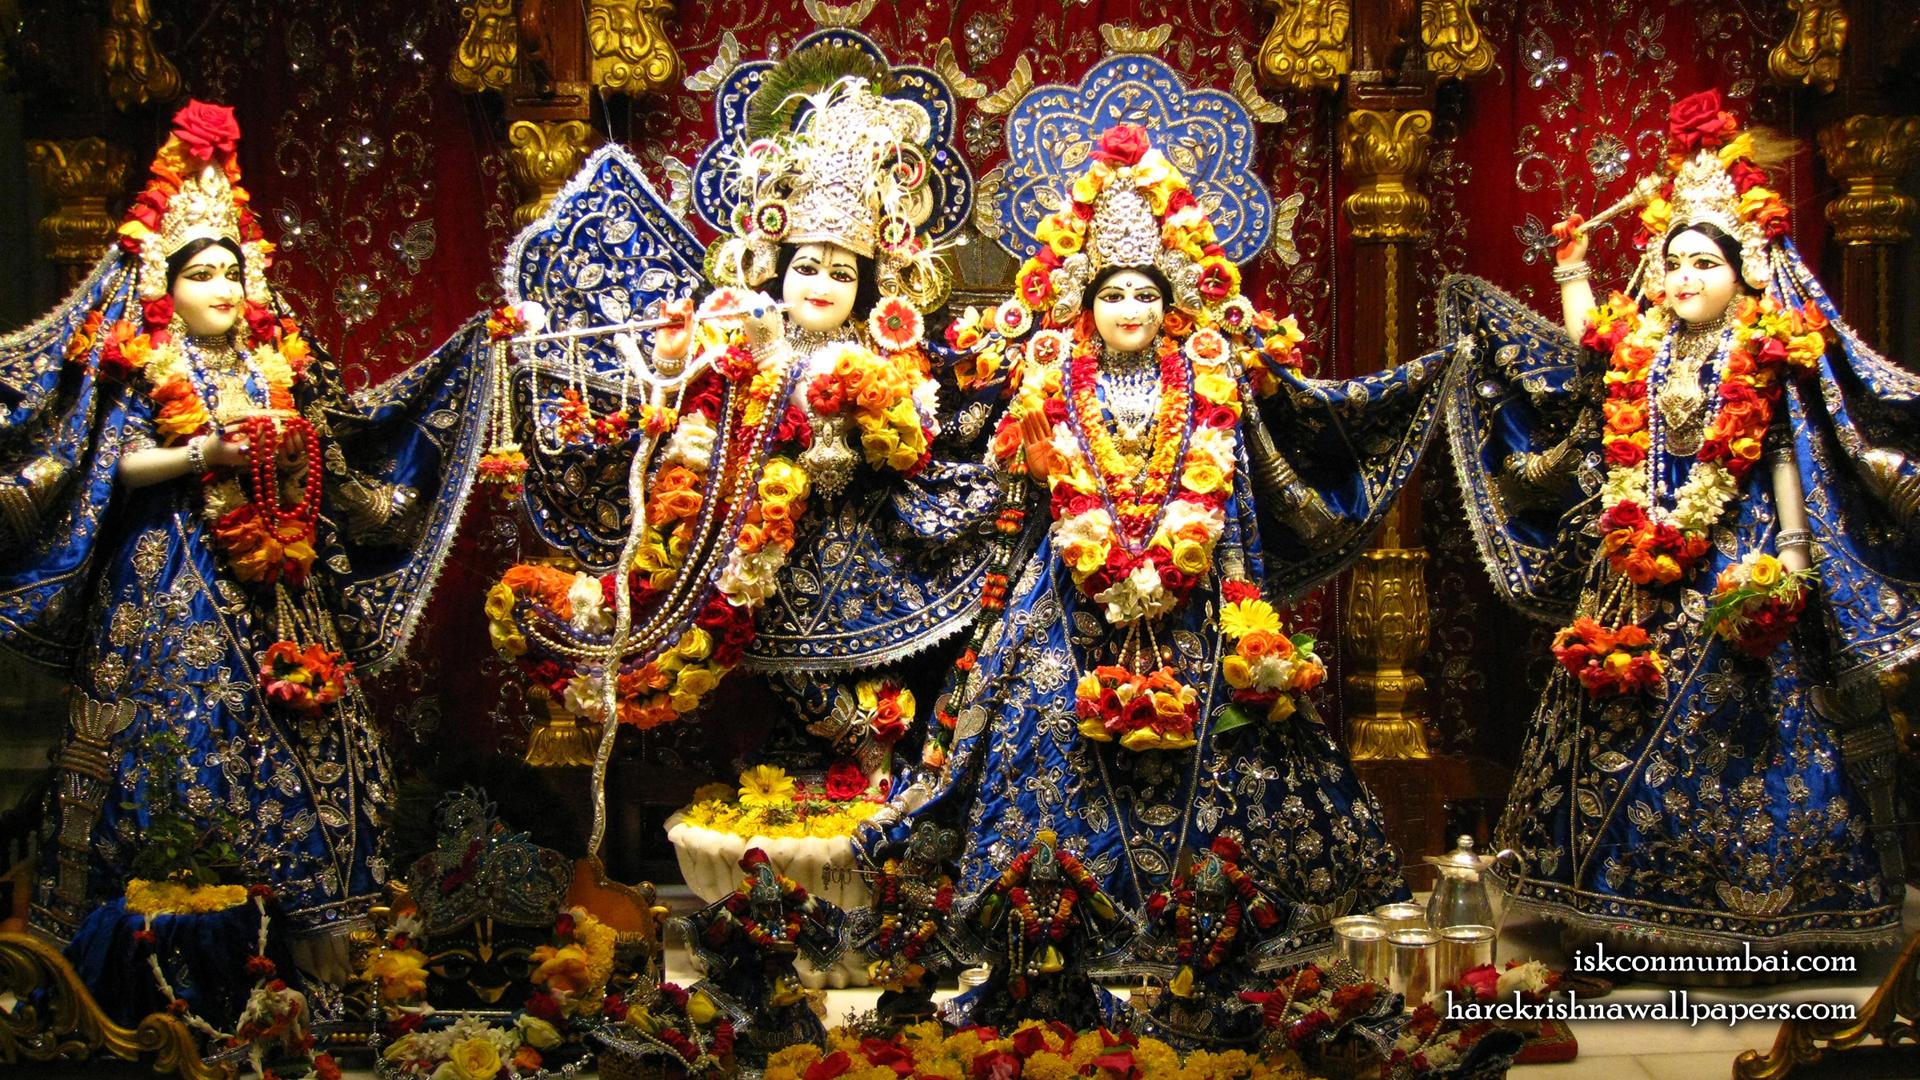 Sri Sri Radha Rasabihari Lalita Vishakha Wallpaper (010) Size 1920x1080 Download